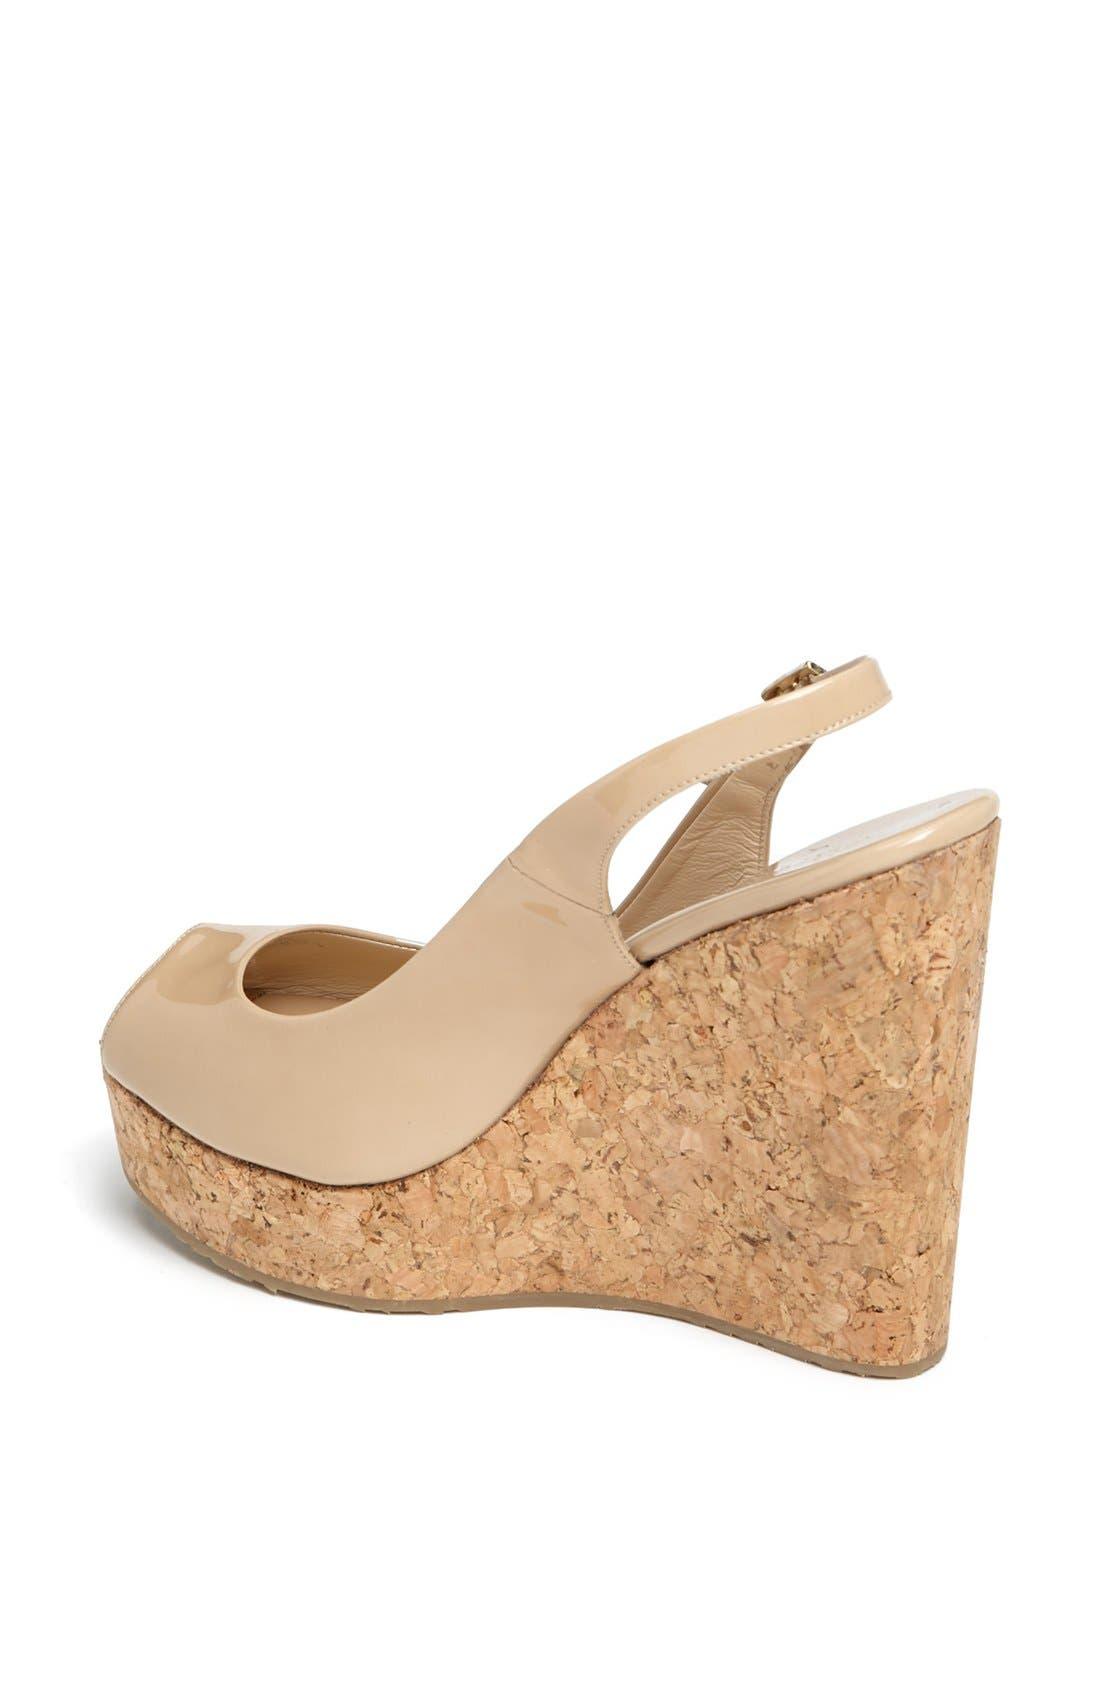 'Prova' Cork Slingback Wedge Sandal,                             Alternate thumbnail 2, color,                             Nude